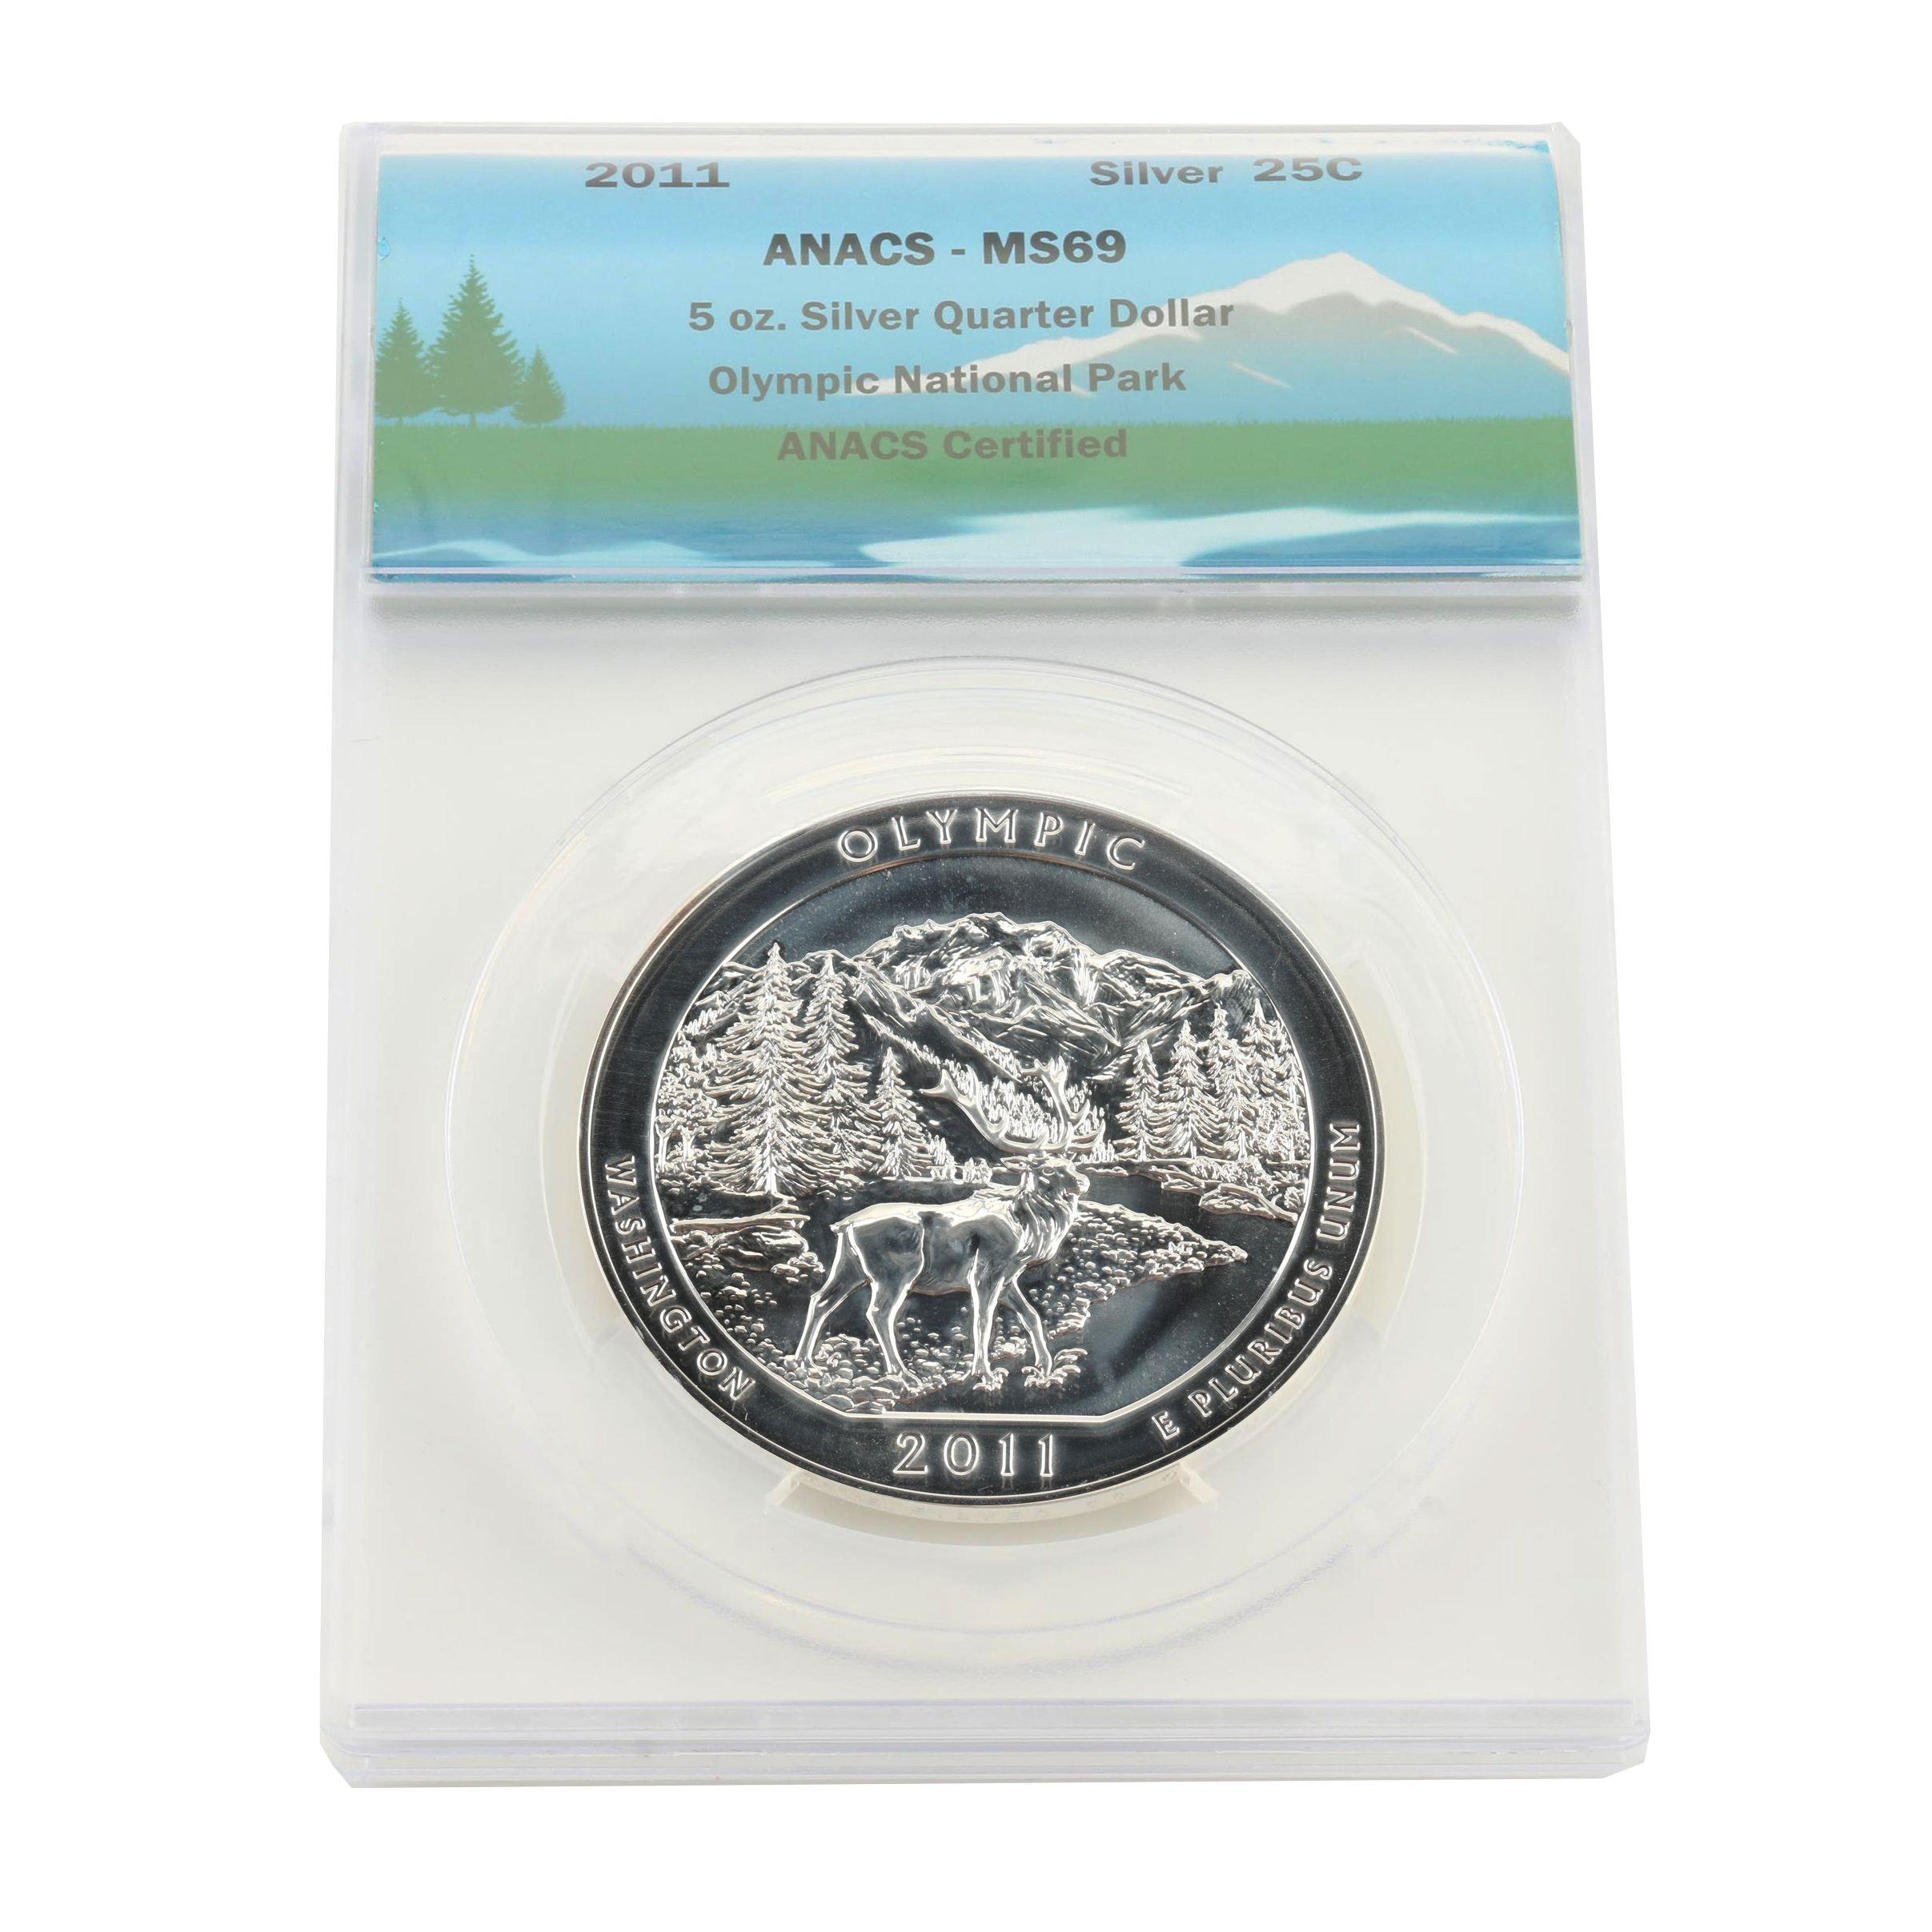 ANACS Graded MS69 5 Oz. Olympic National Park Silver Bullion Coin